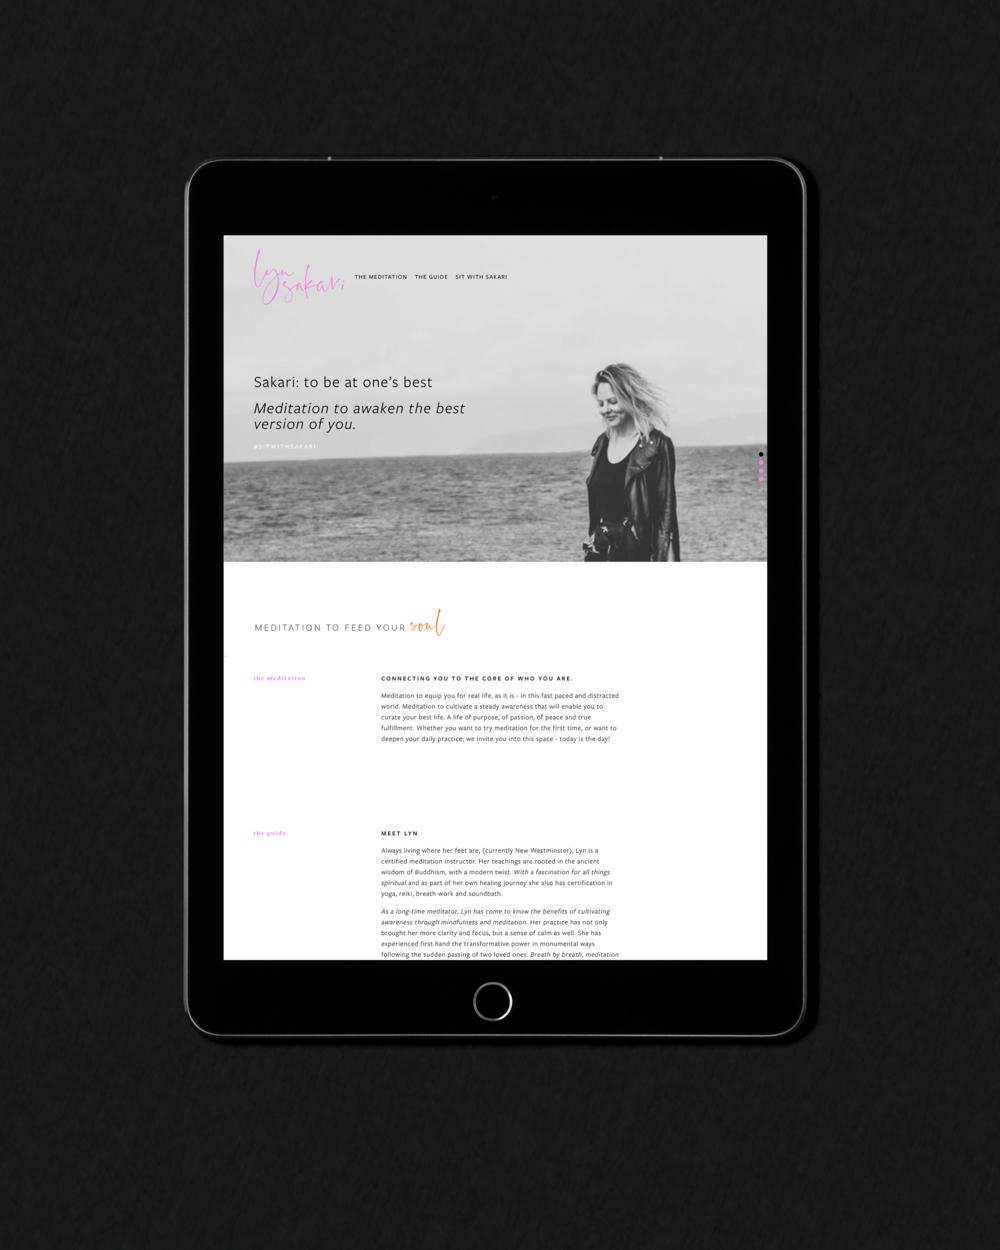 Lyn Sakari website shown on an iPad on a black background